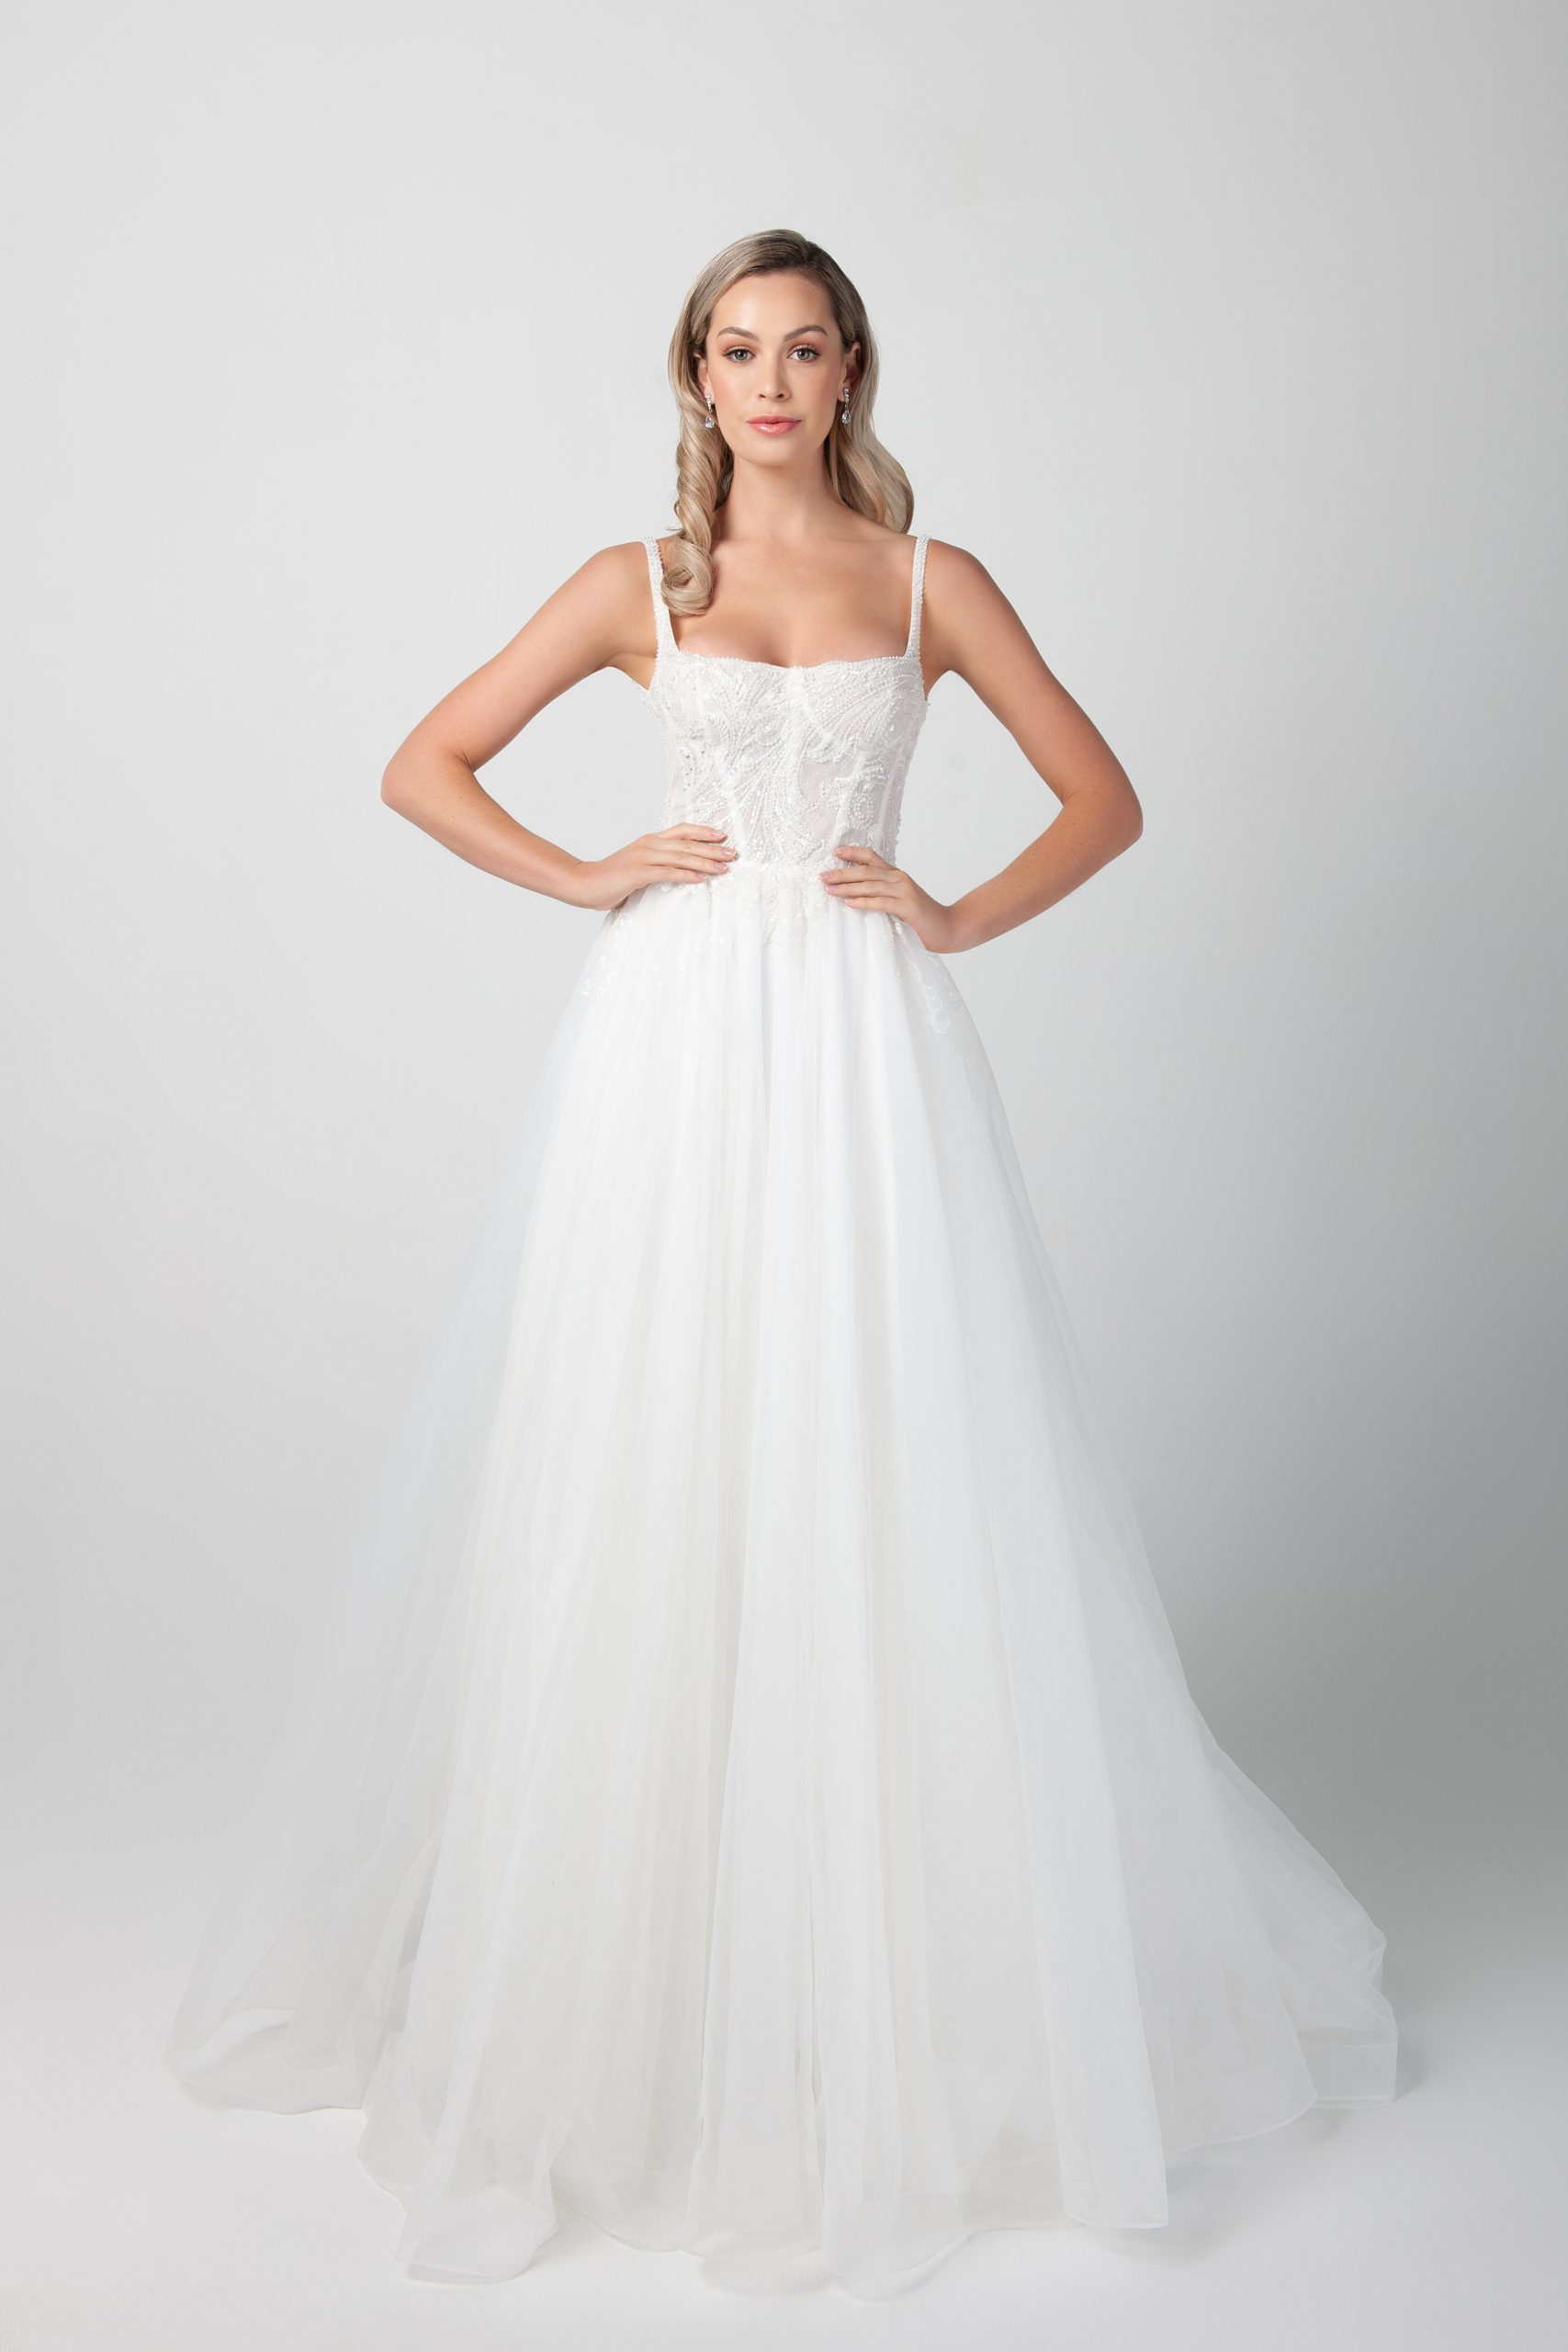 Spaghetti Strap Beaded Lace Soft Bodice A Line Skirt Wedding Dress Kleinfeld Bridal